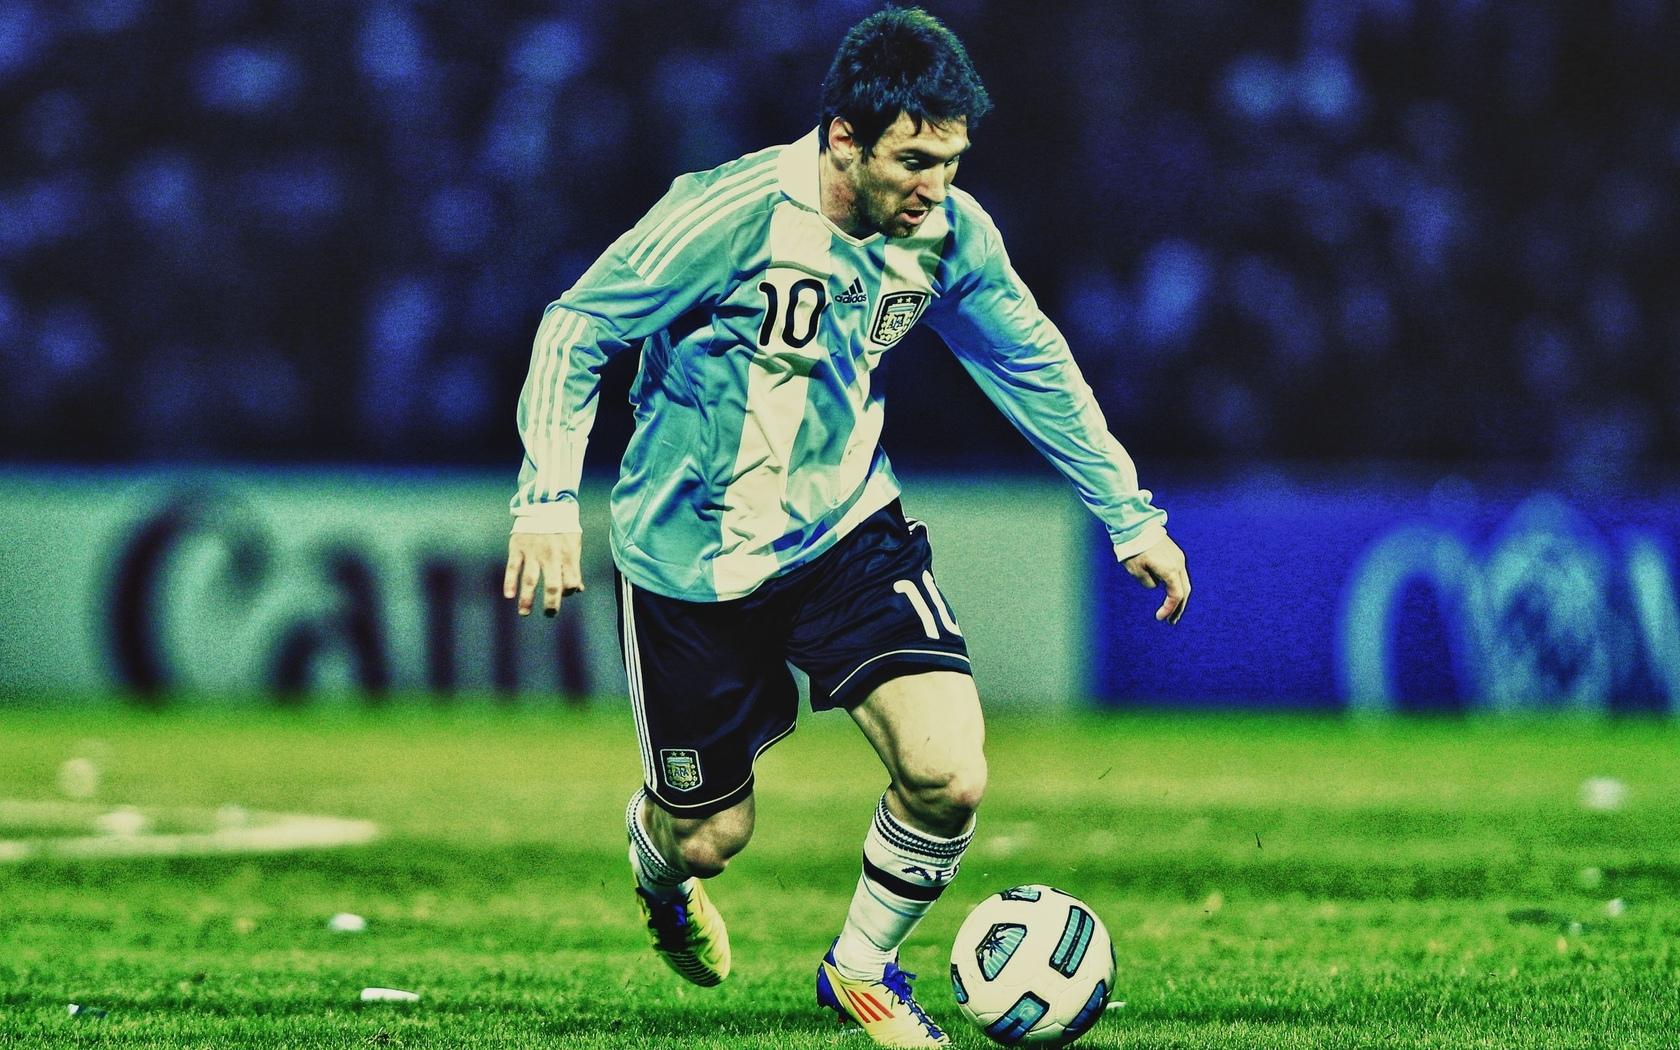 Картинка мяч, футболист, ведёт, футбол ...: look.com.ua/download/10299/1680x1050